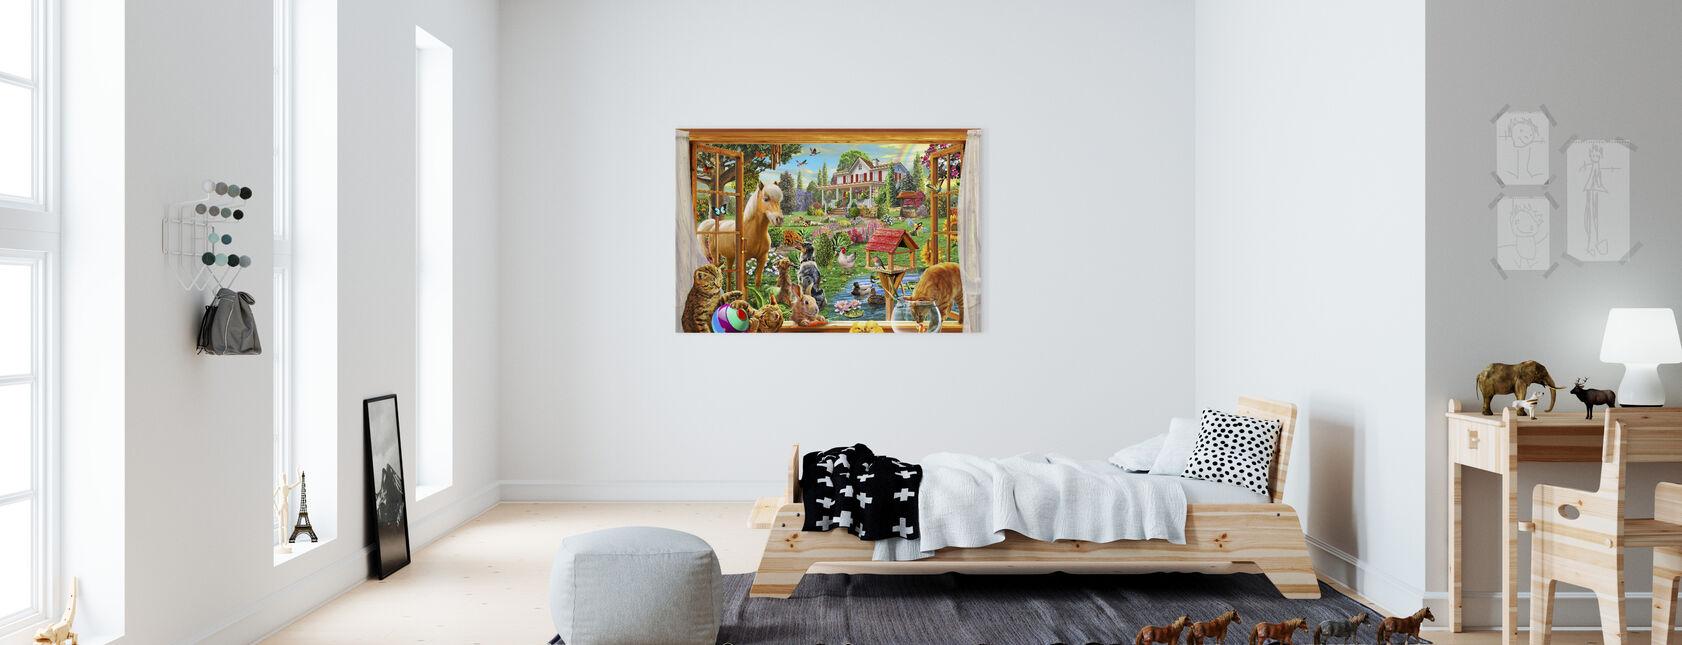 Dieren in de tuin - Canvas print - Kinderkamer